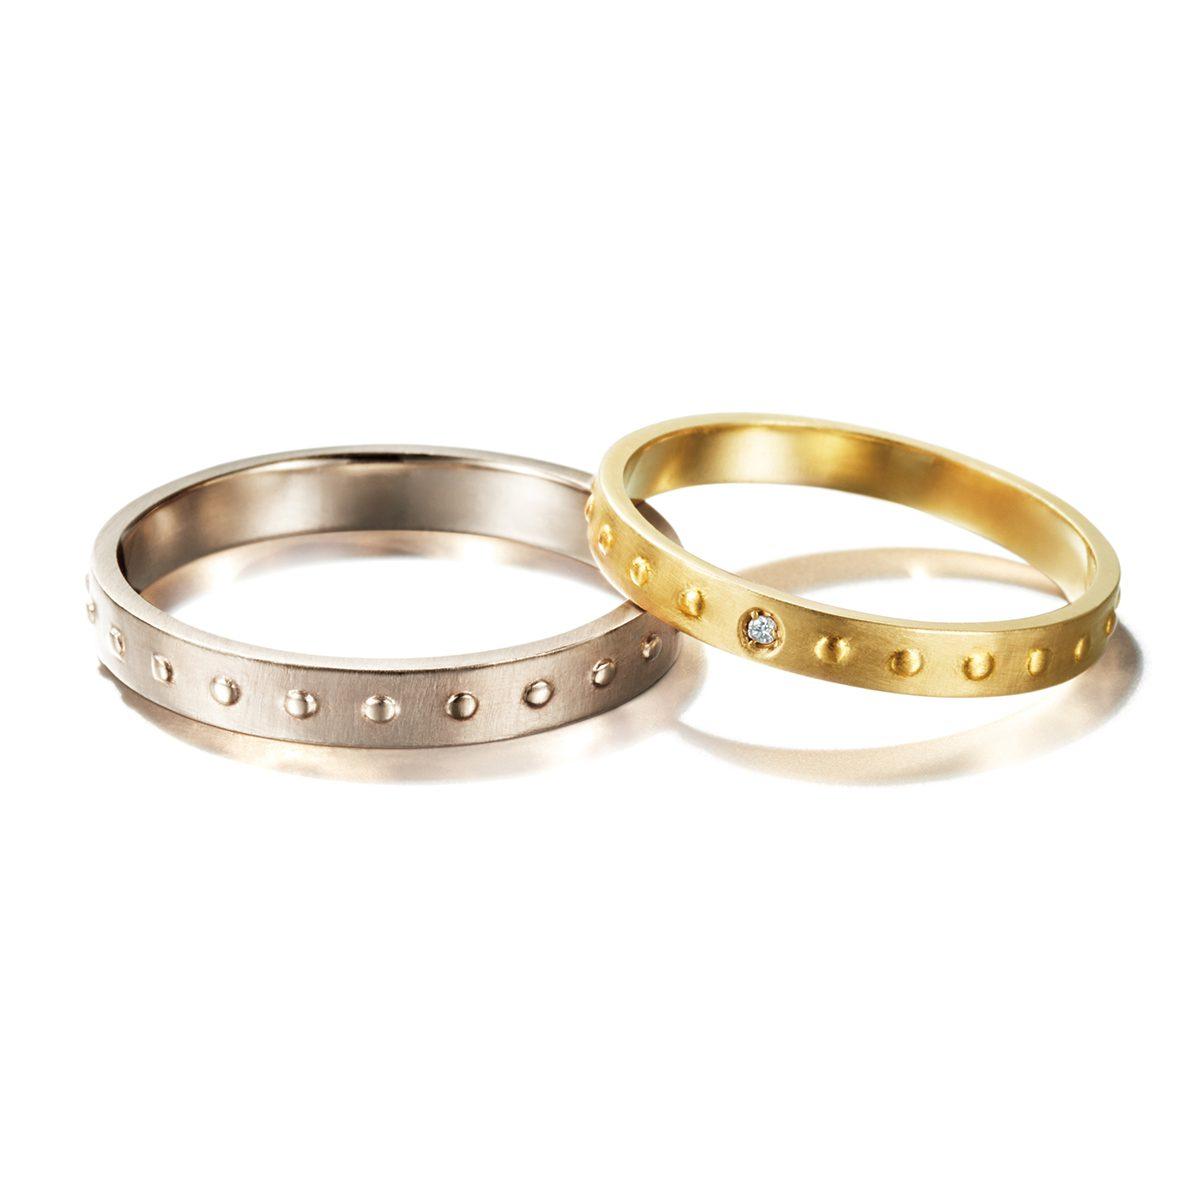 LIA DI GREGORIO - DOTS Marriage Rings